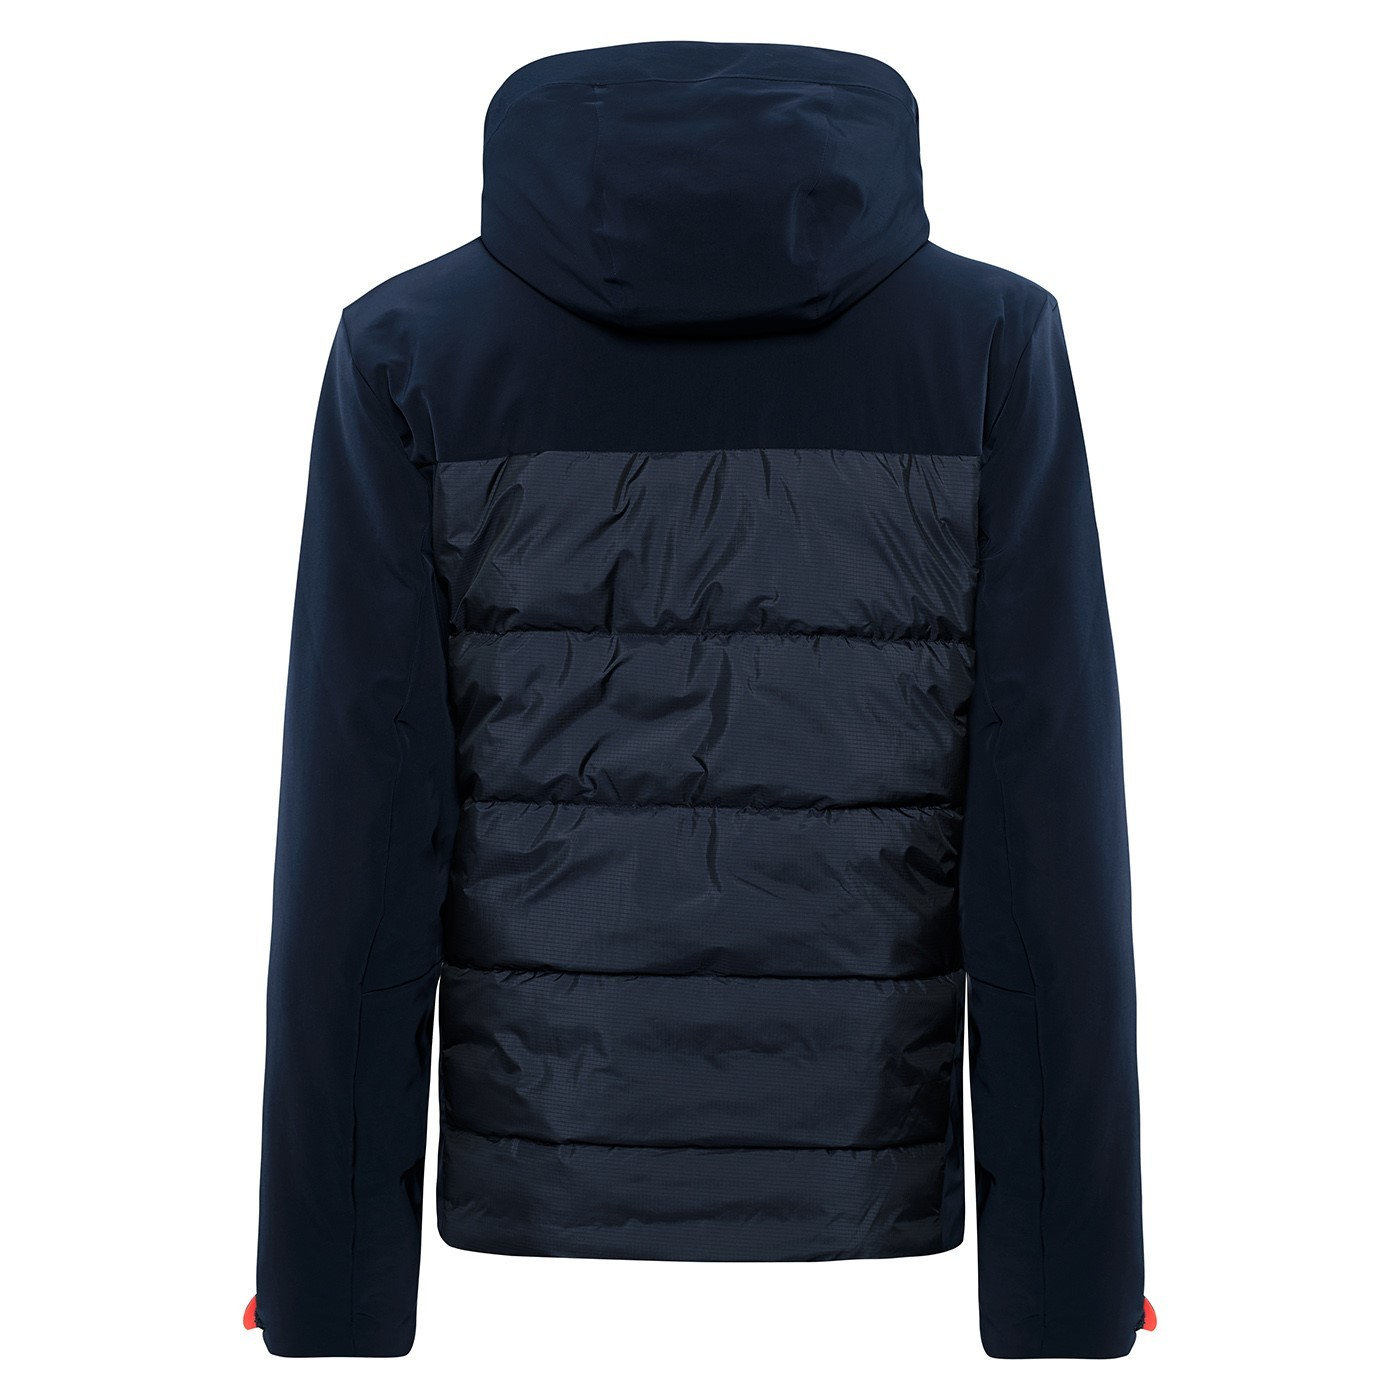 Toni Sailer Colin Twotone Jacket 2021